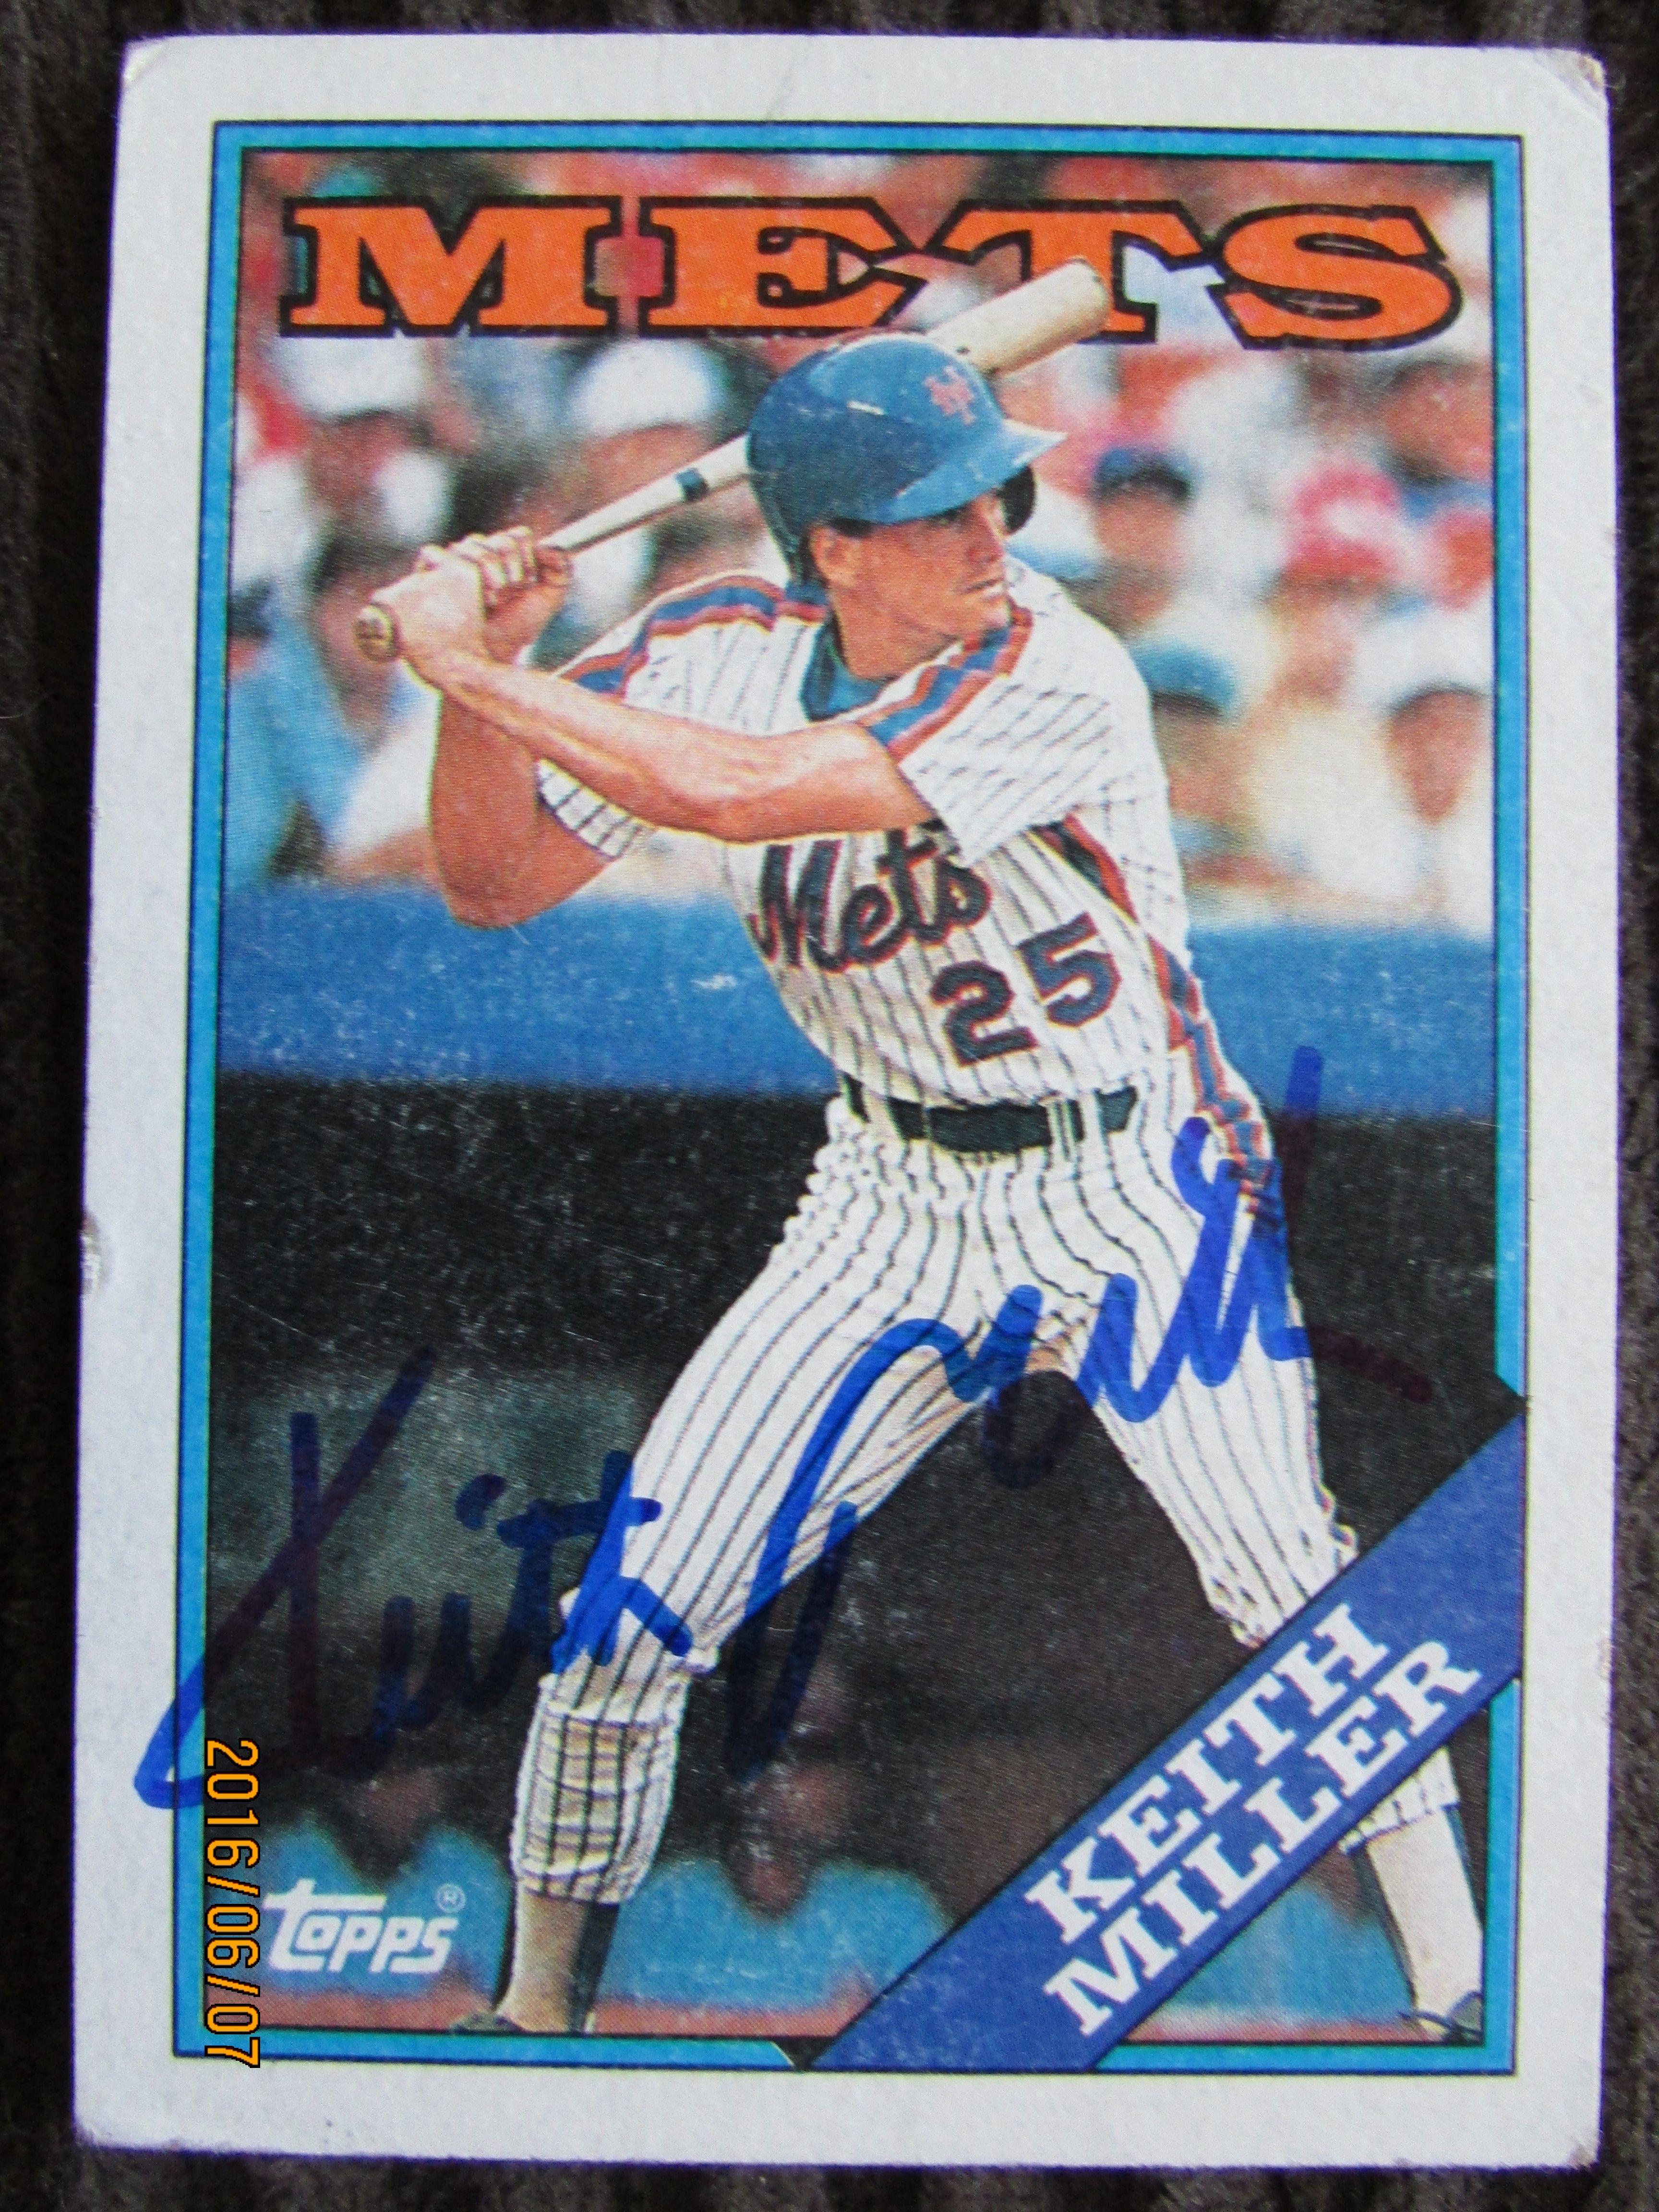 1988 Topps Ttm Baseball Cards Teams Sports